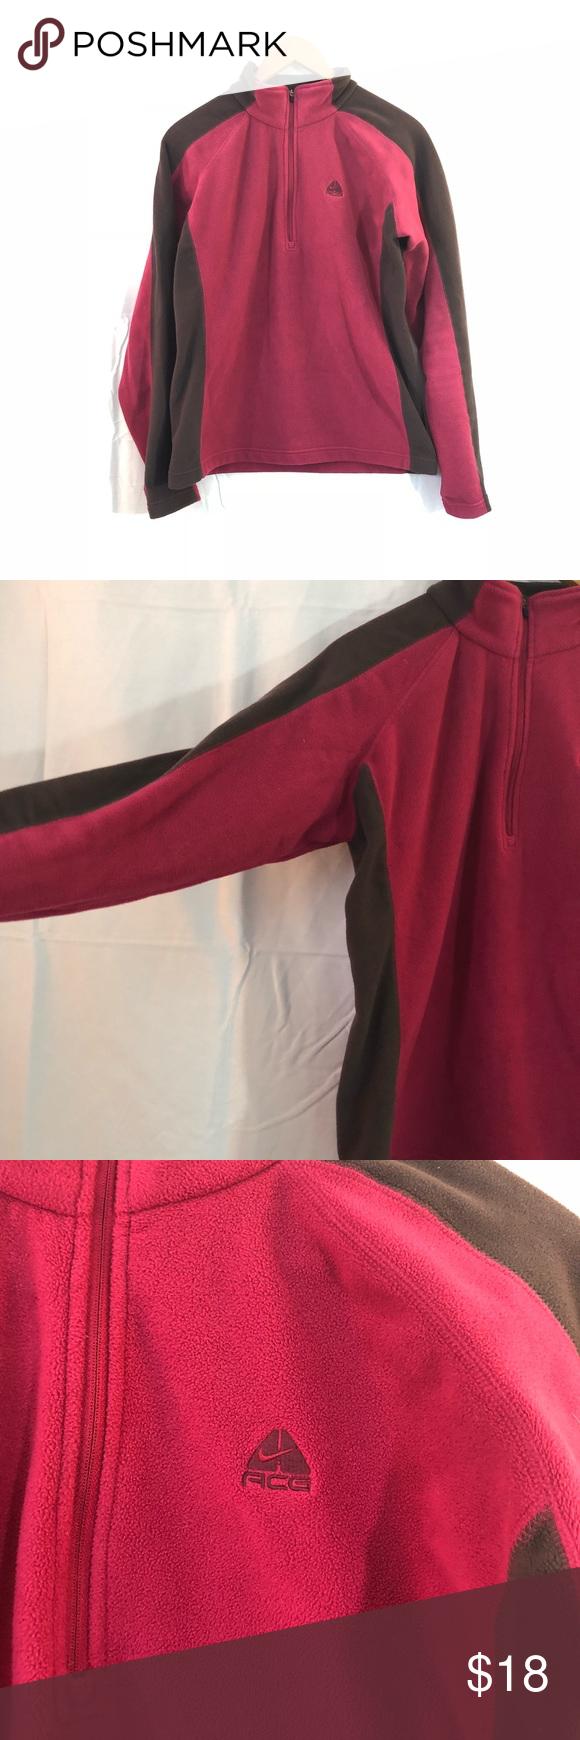 Nike acg zip brown and pink fleece my posh closet